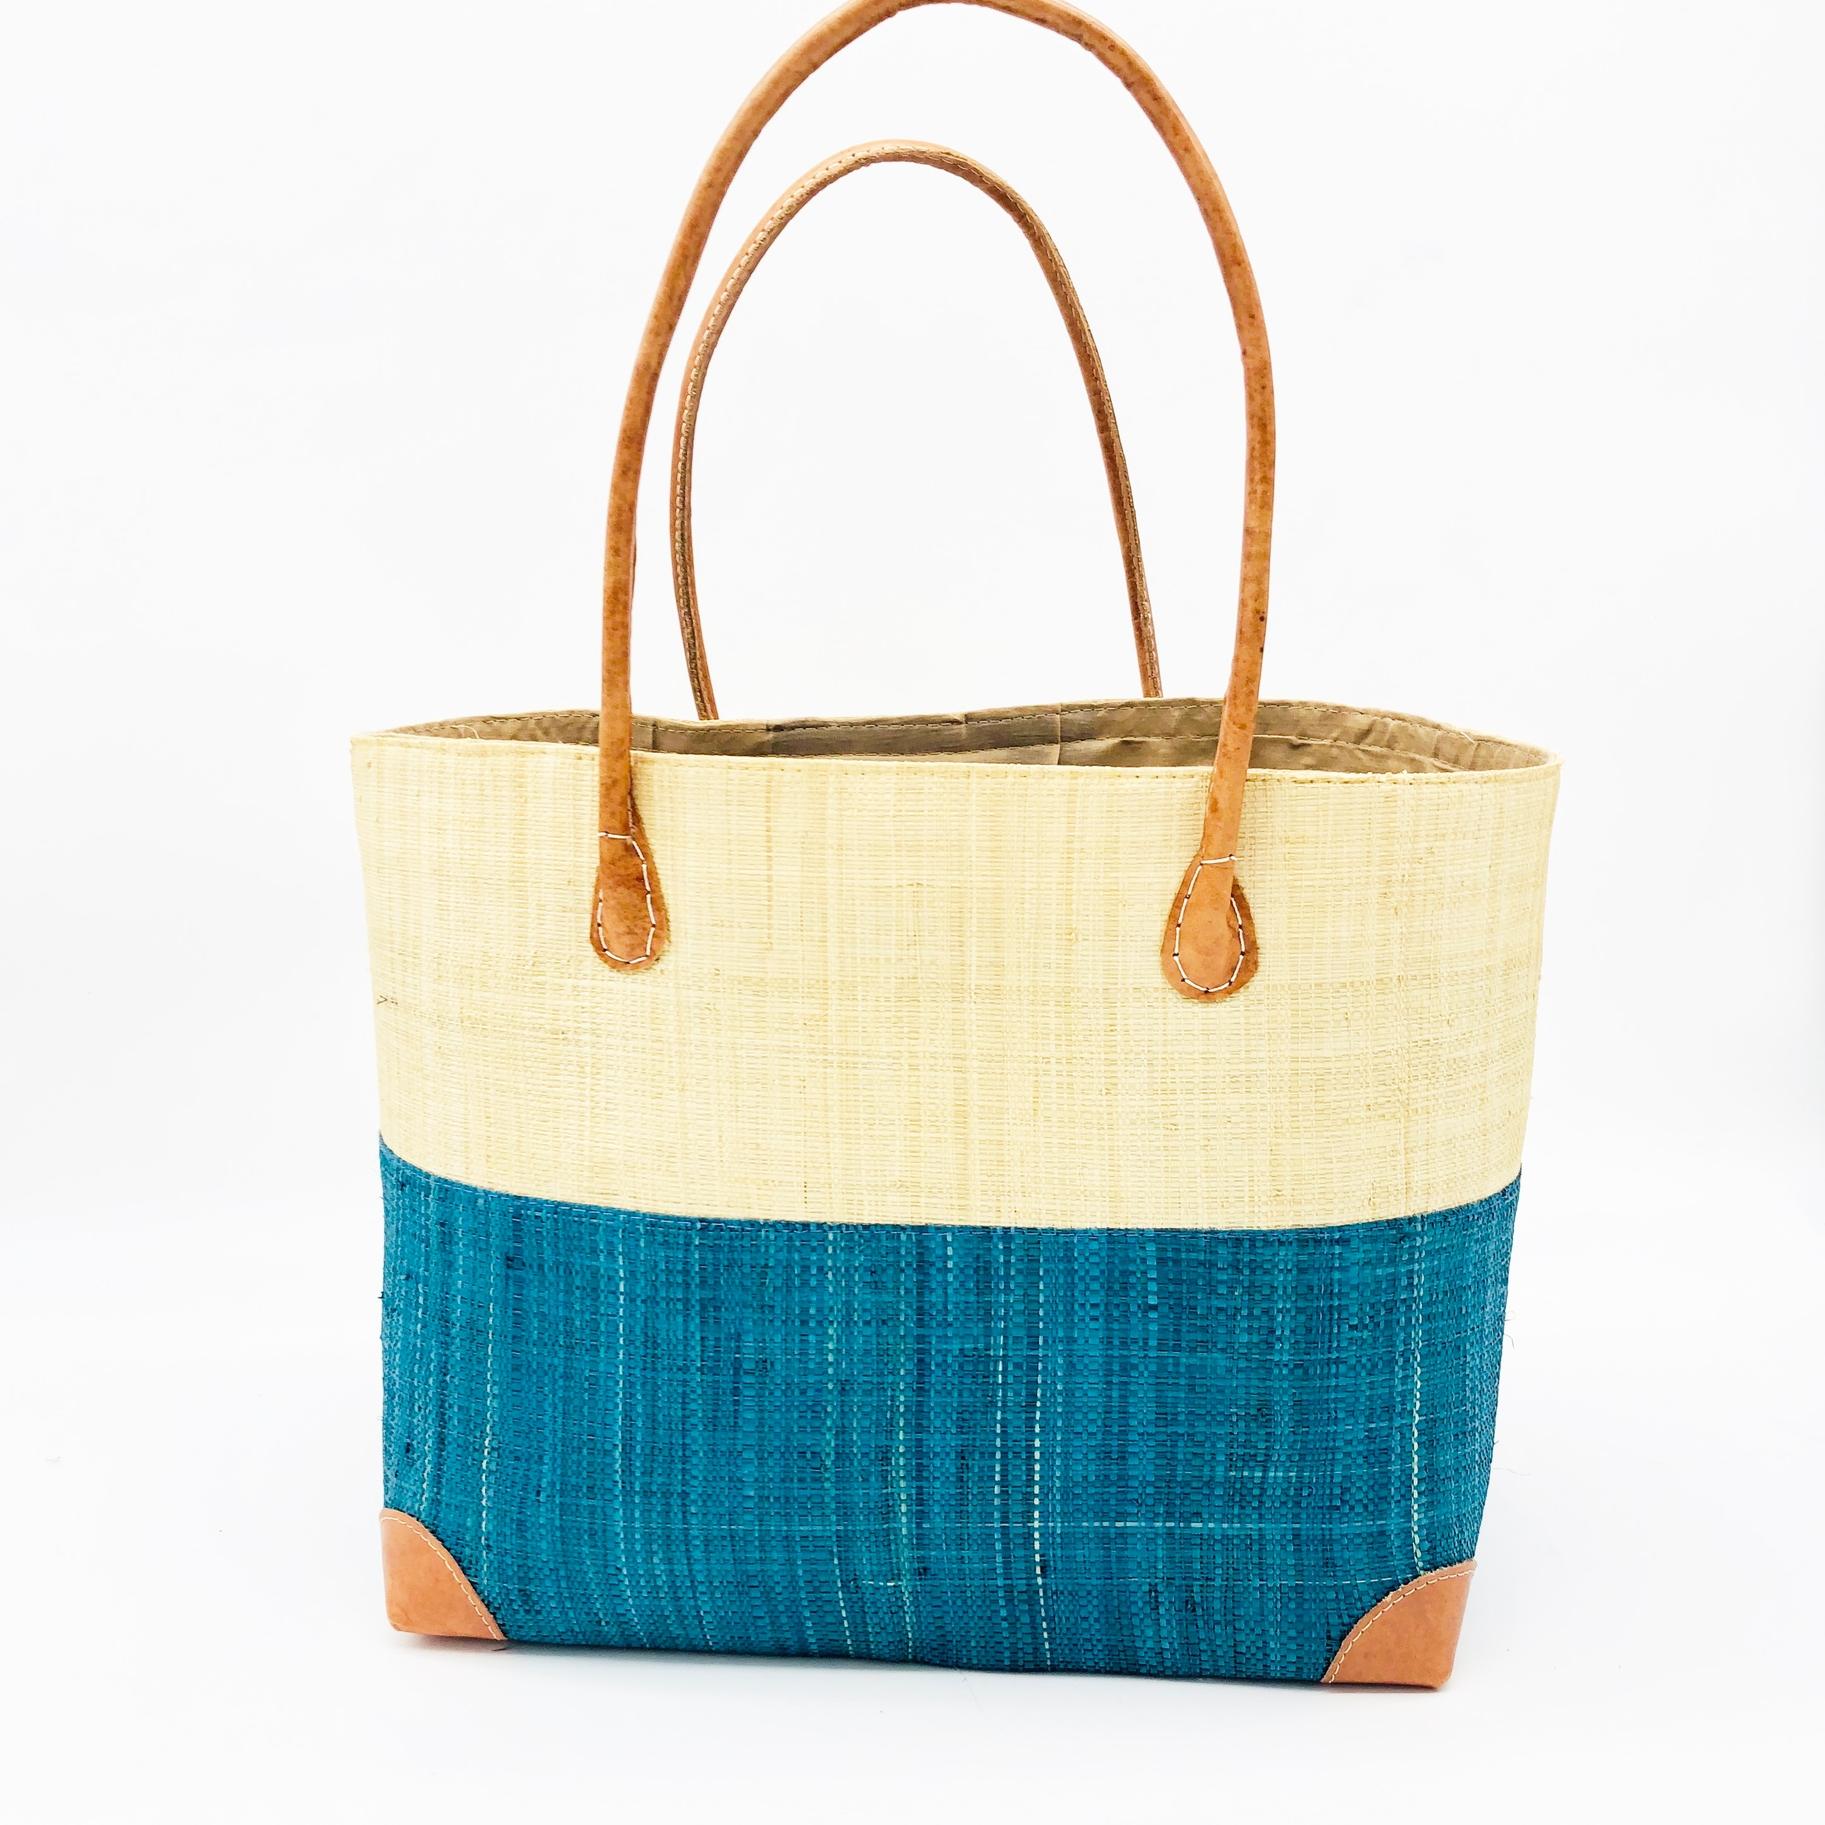 Trinidad Two Tone Straw Basket - Aqua | Trada Marketplace